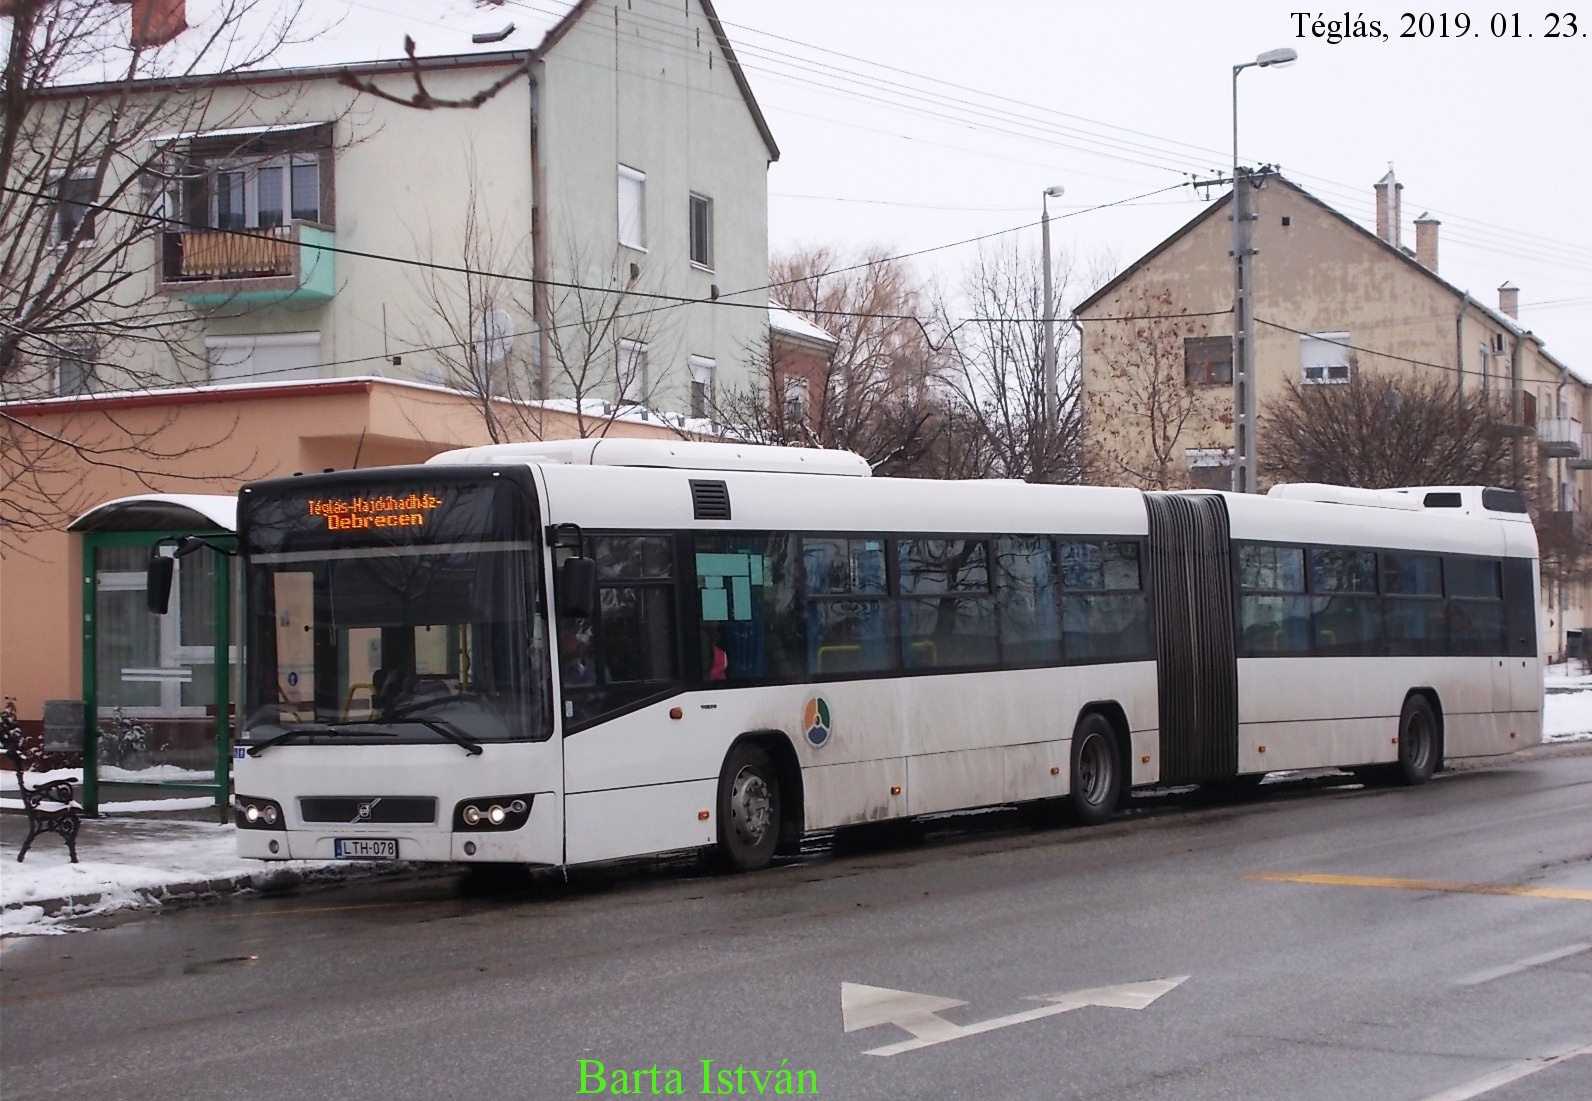 LTH-078-4